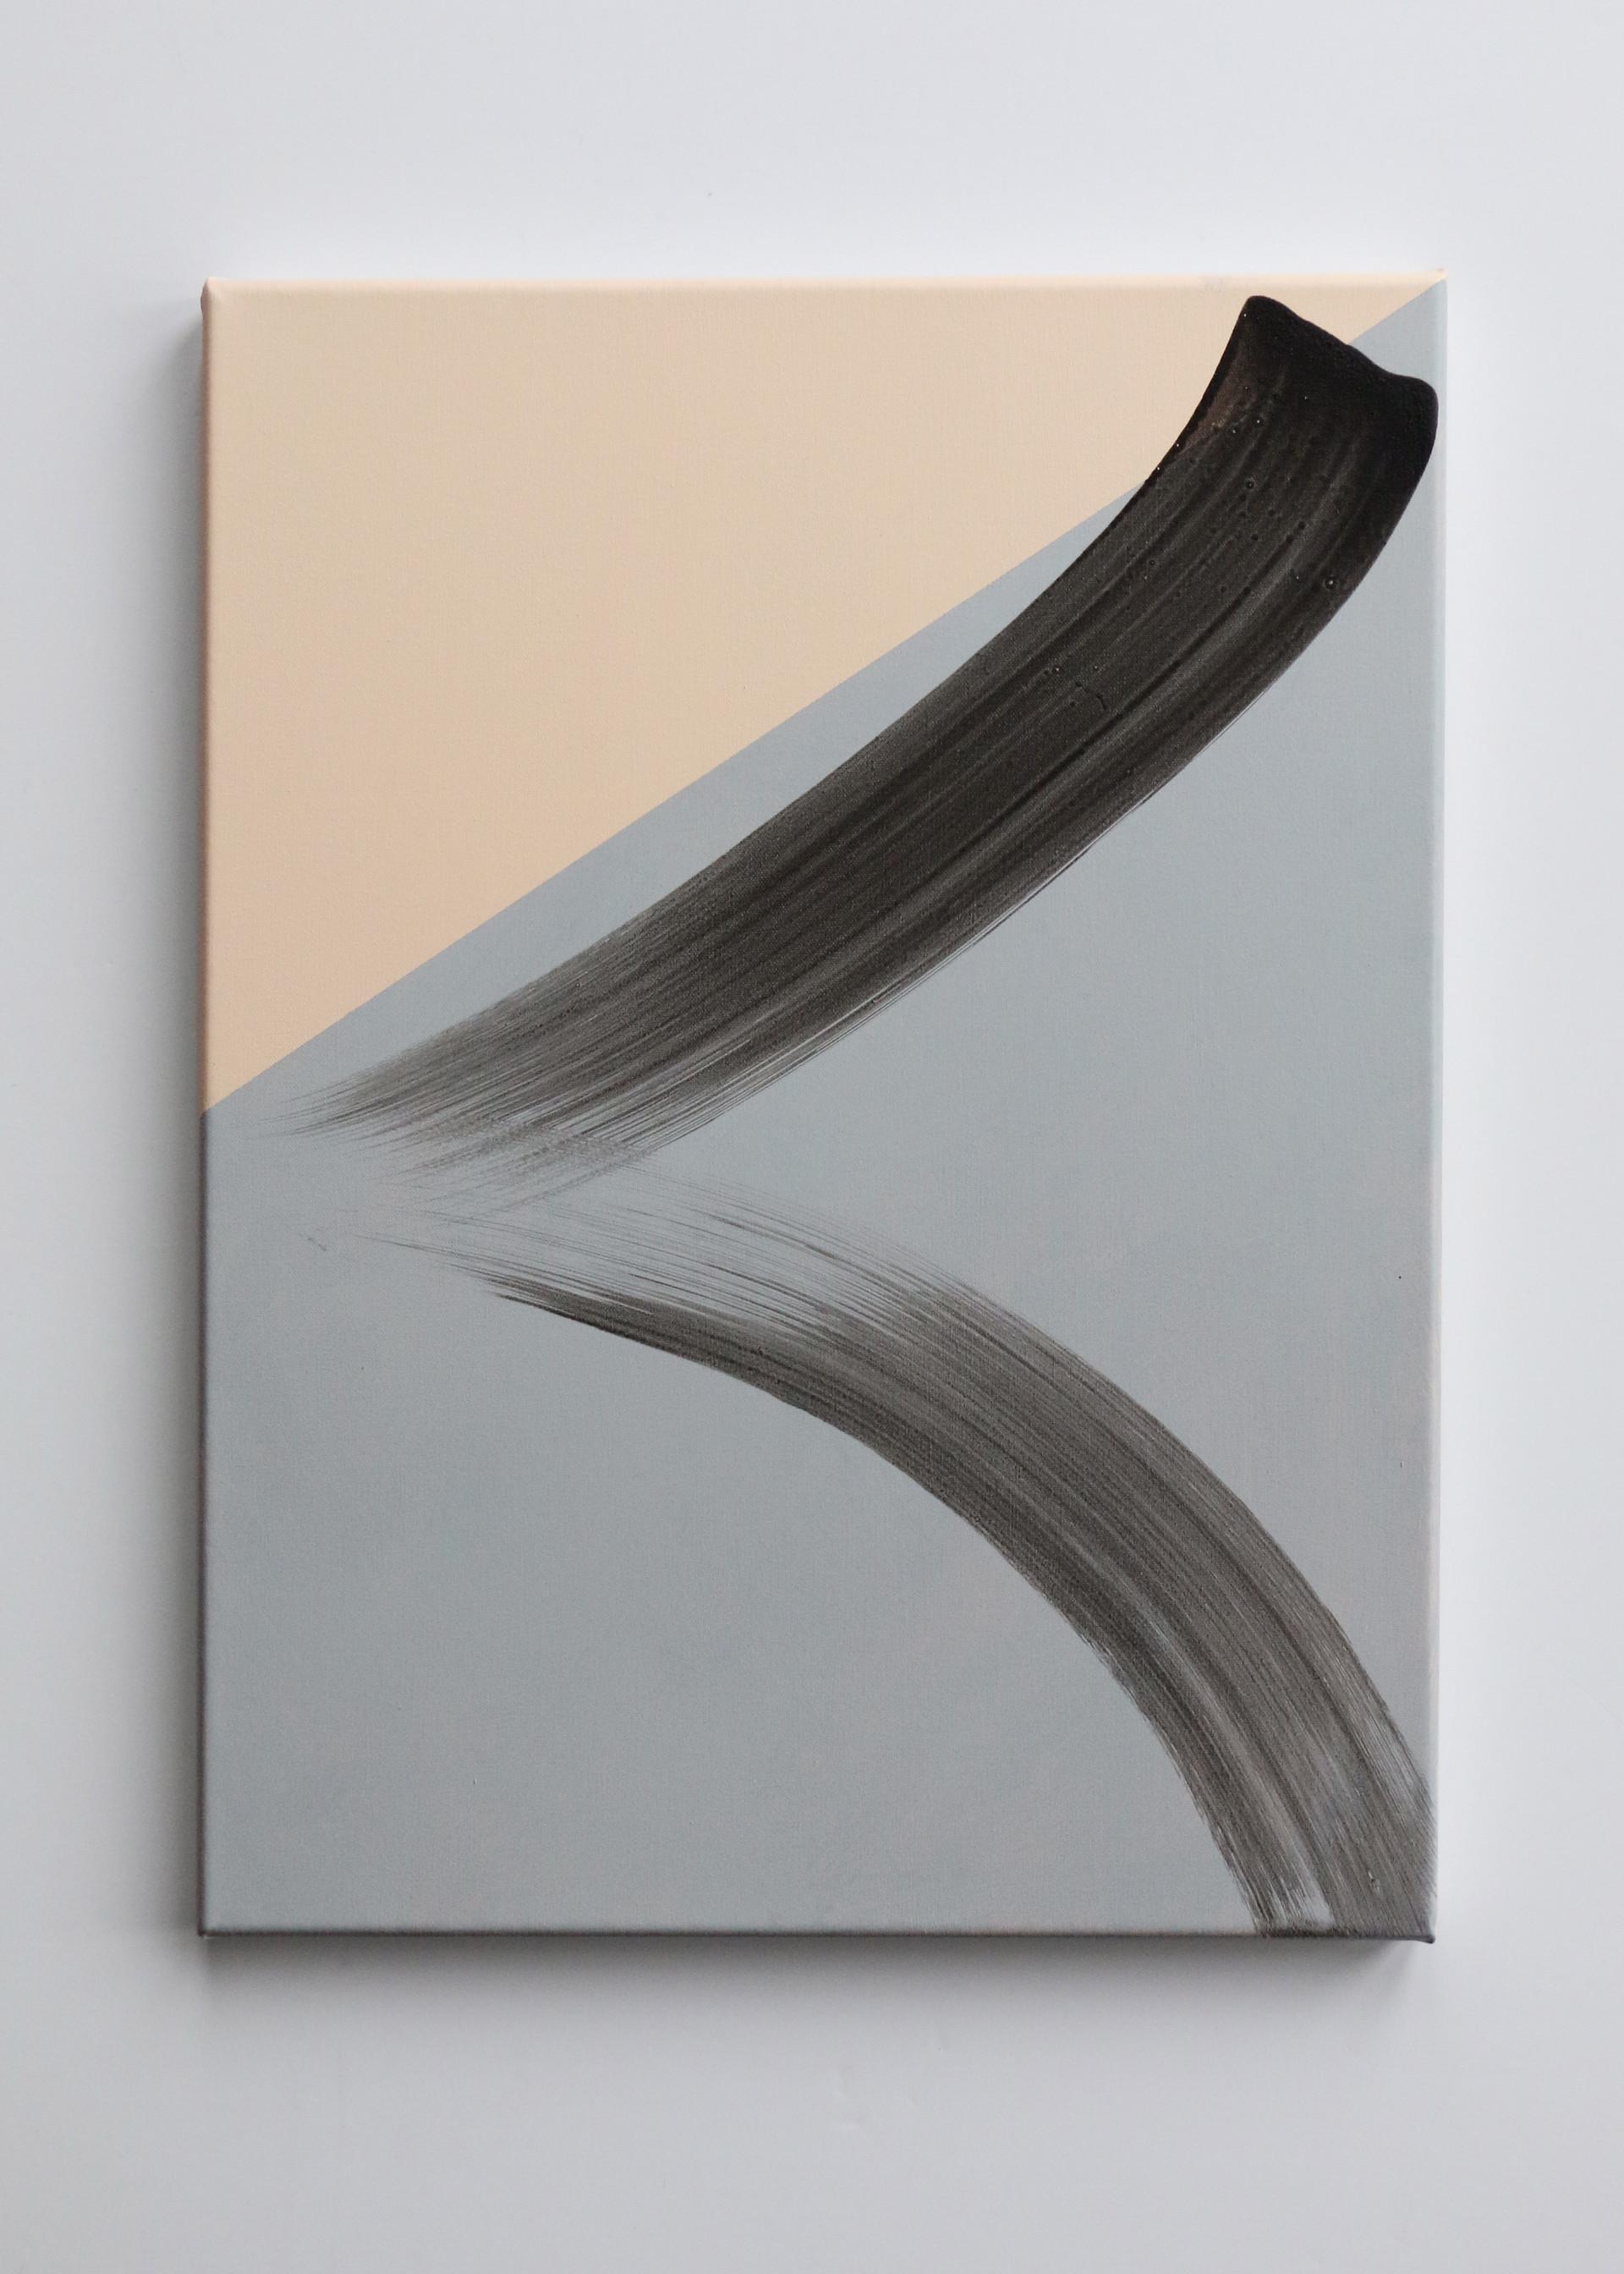 Chasing Light, acrylic on canvas, 40 x 30cm